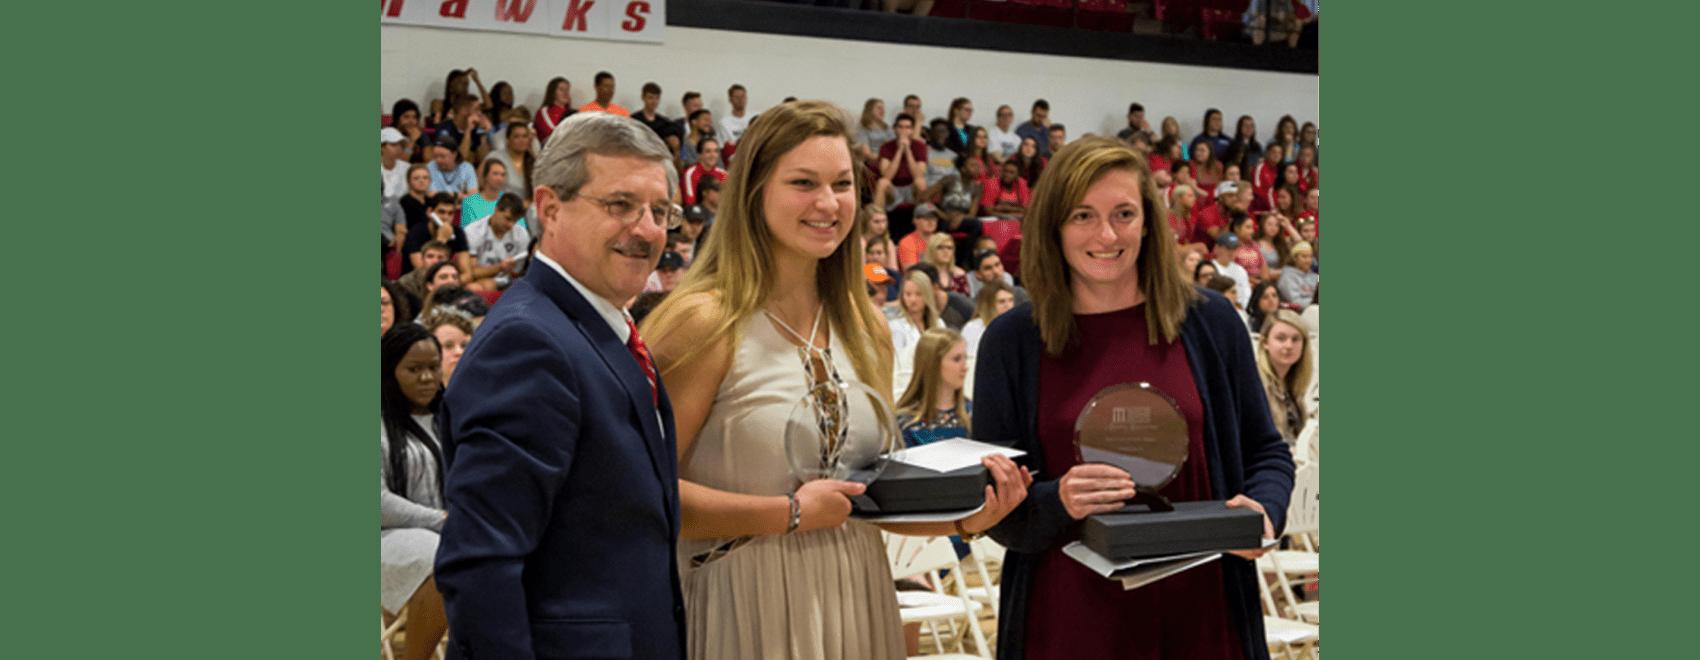 Exemplary Student Award